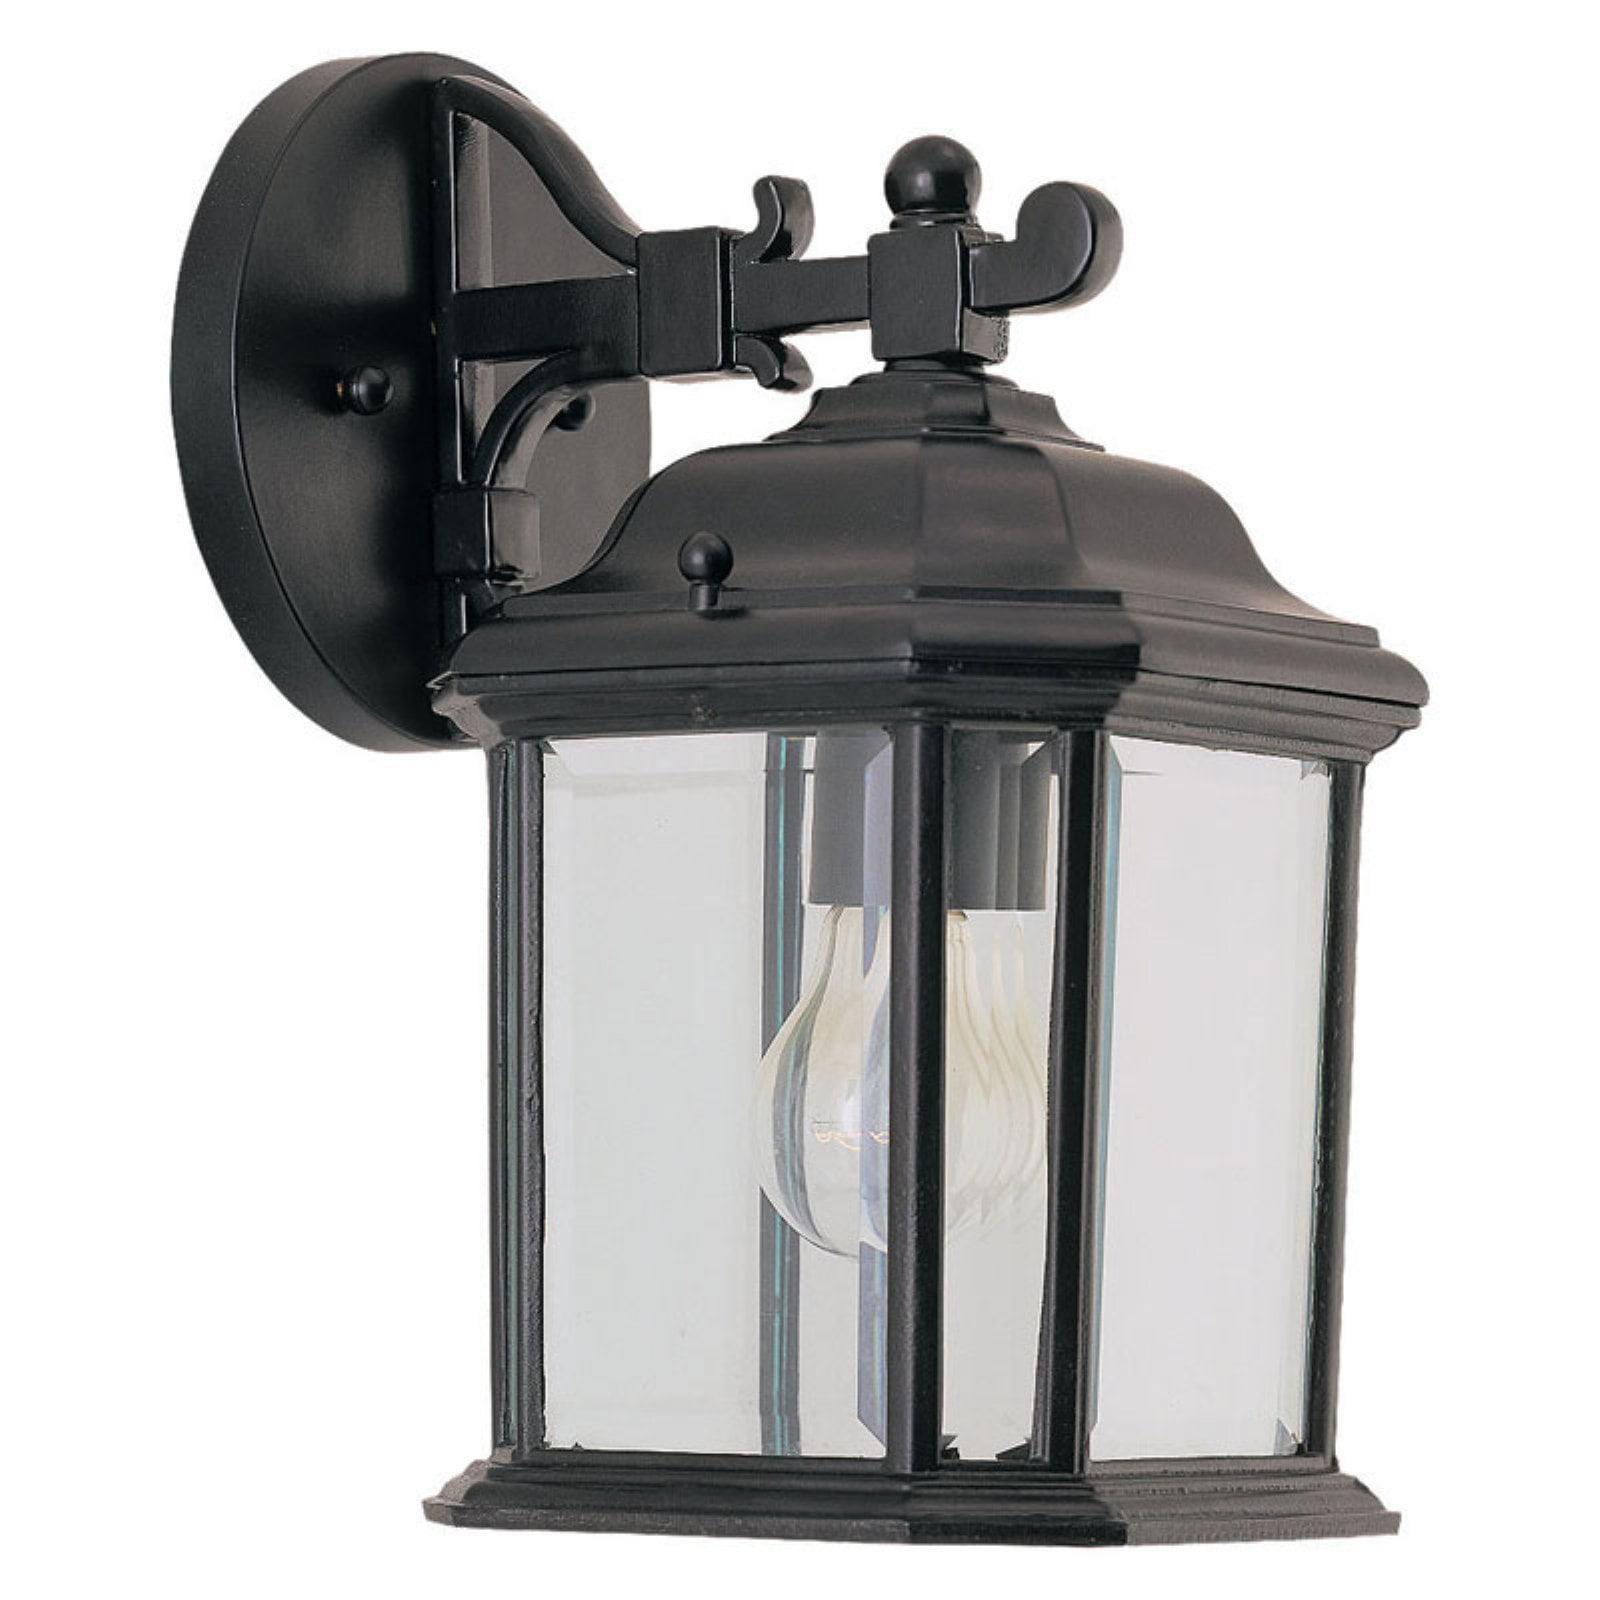 Sea Gull Kent Outdoor Hanging Wall Lantern - 11.25H in. Black